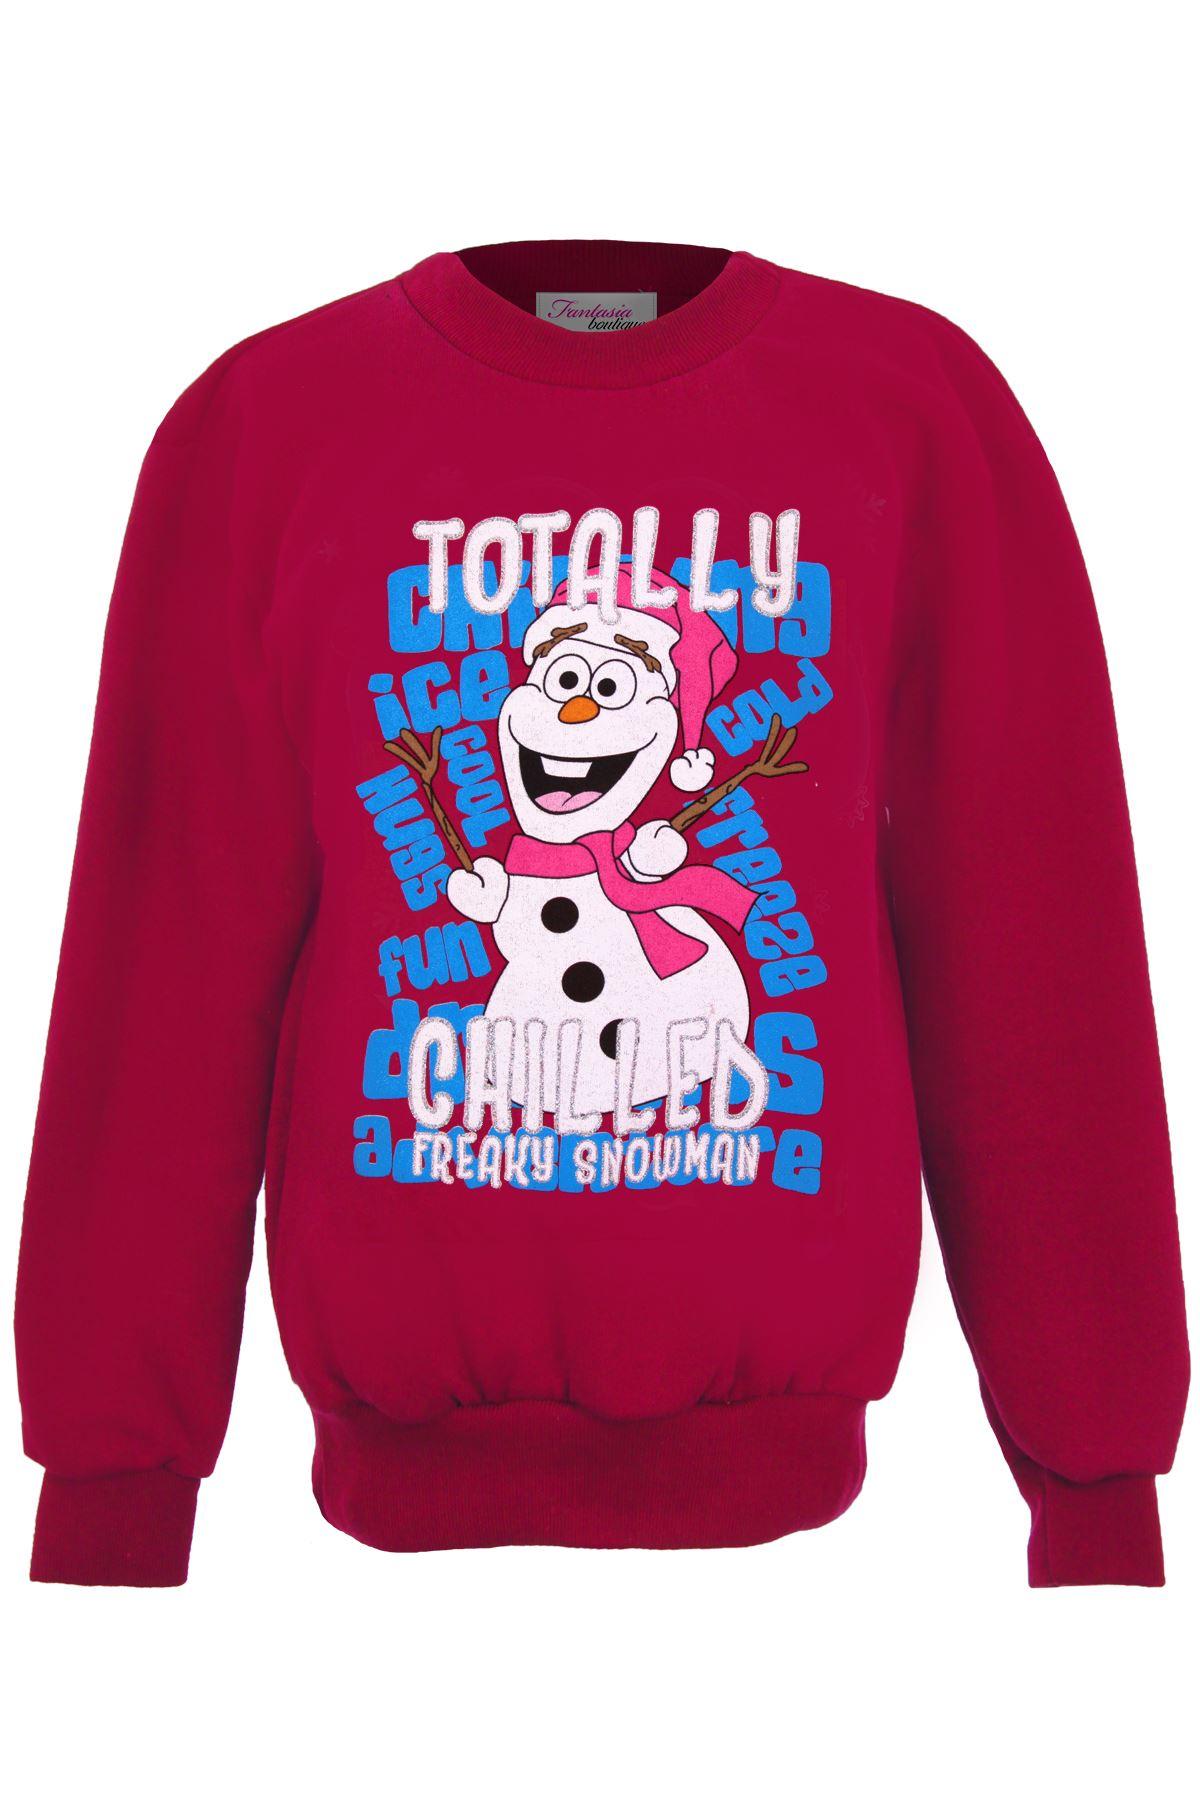 Girls Christmas Sweatshirt Kids OLAF FROZEN Xmas Totally Chilled Snowman Winter